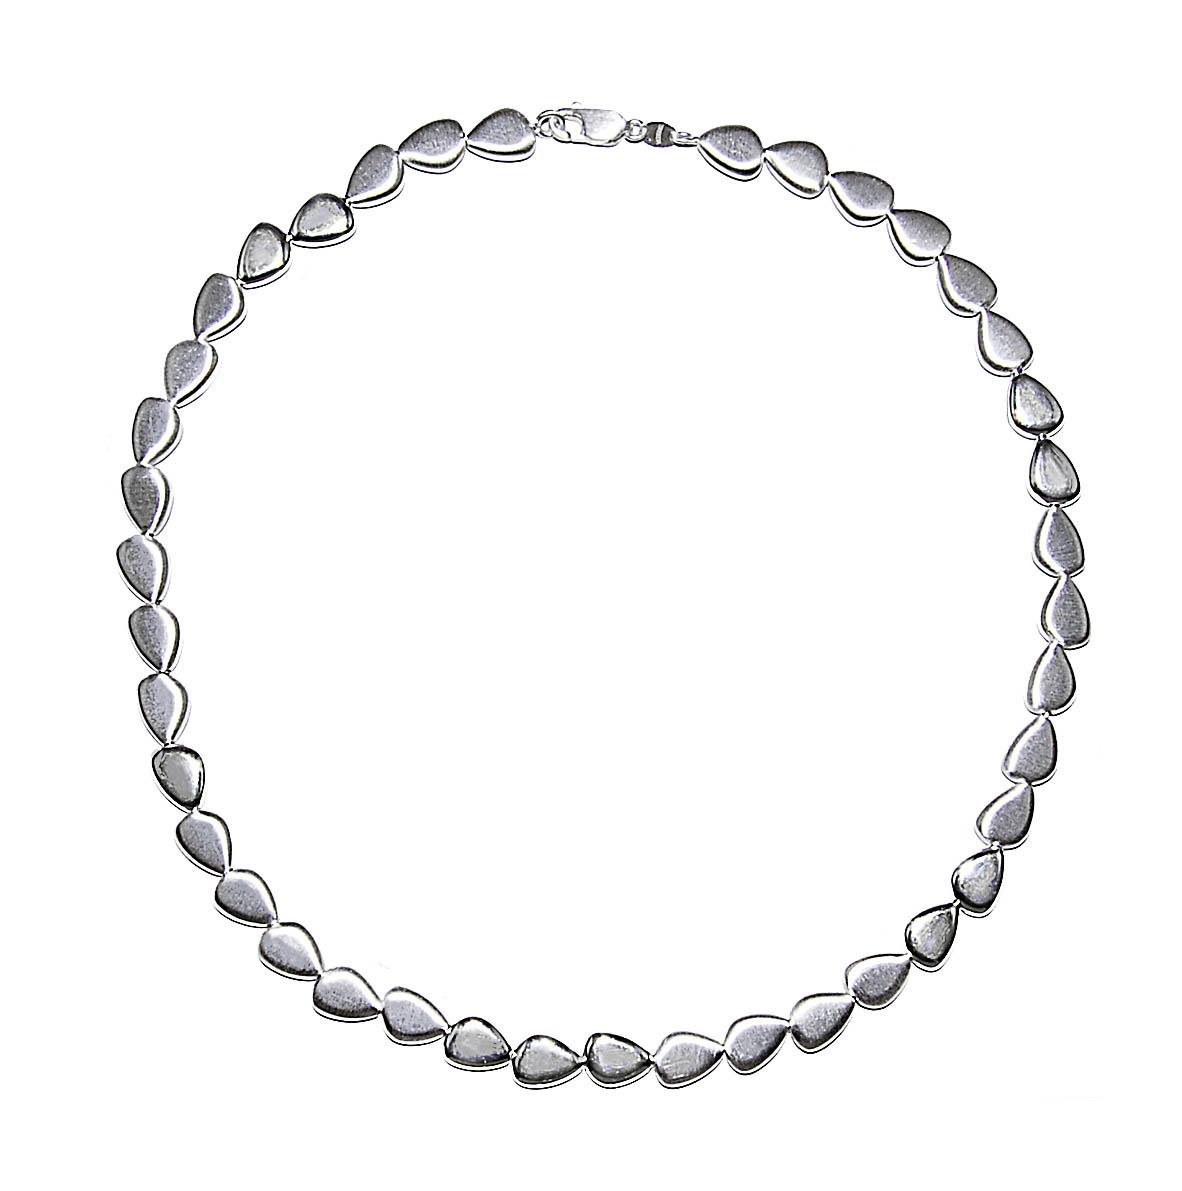 Tezer Sterling Silver Continuous Pebble Necklace